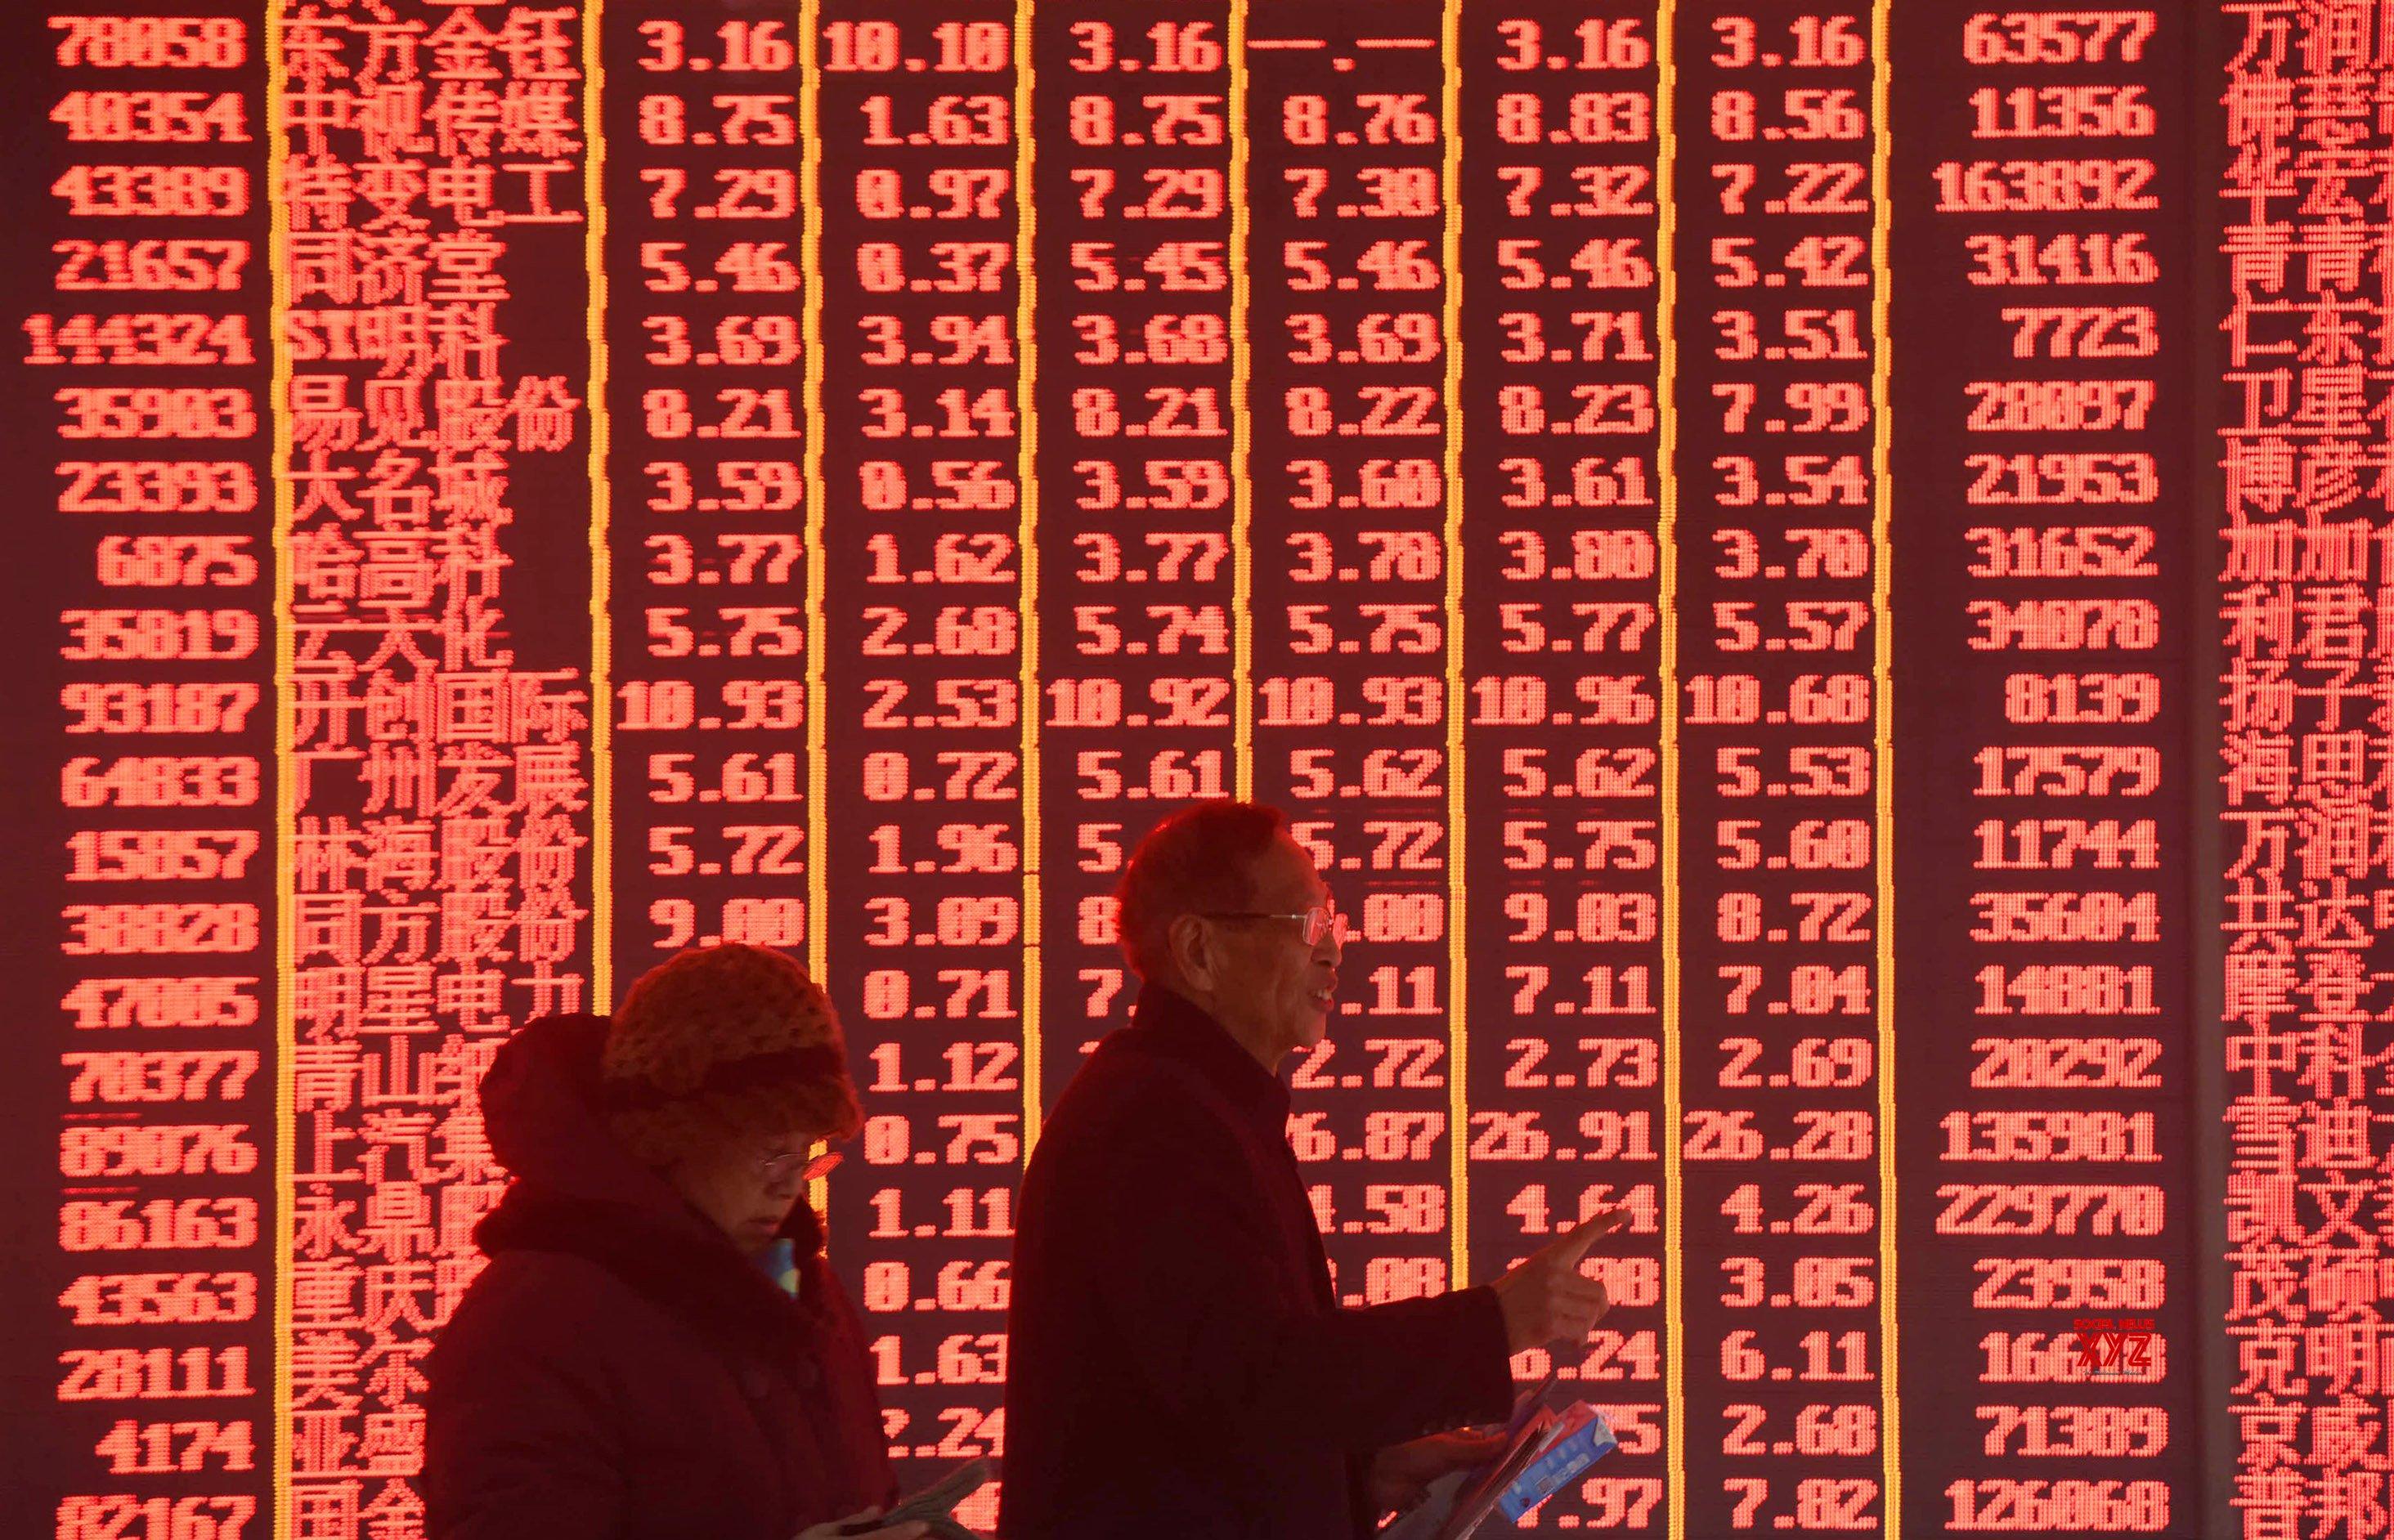 CHINA - STOCKS #Gallery